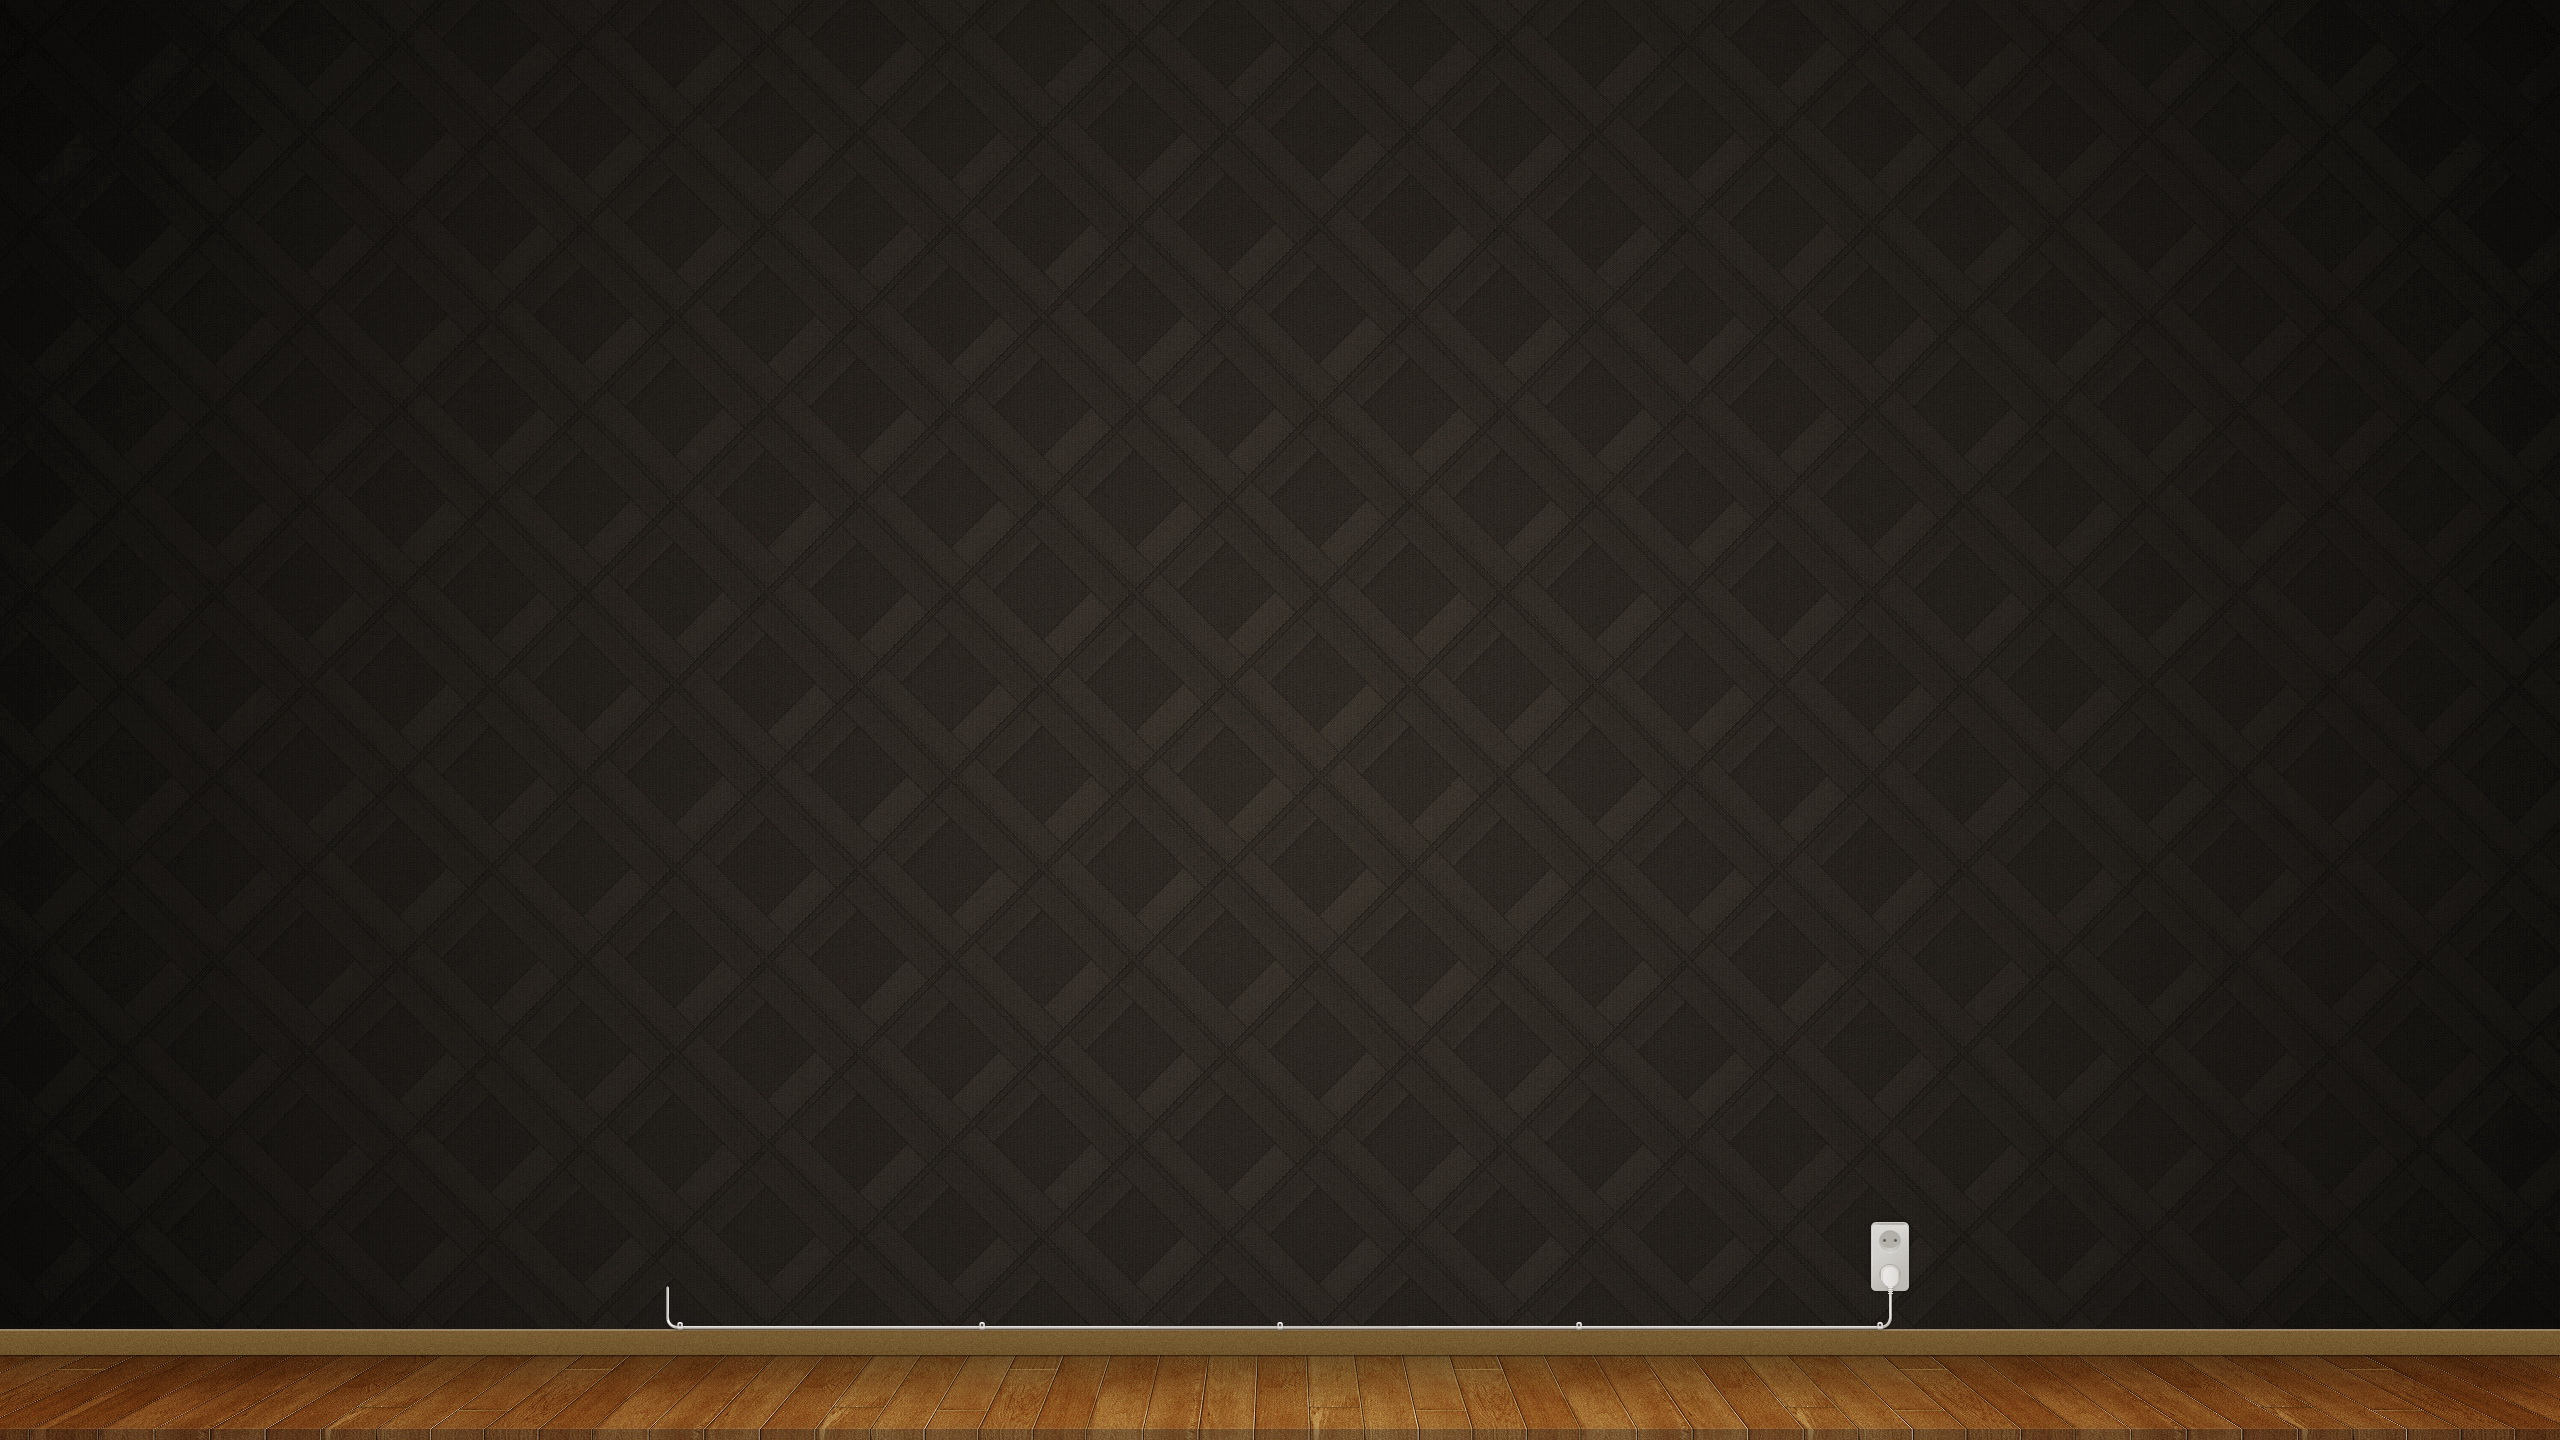 Artistic Hd Wallpaper Background Image 2560x1440 Id